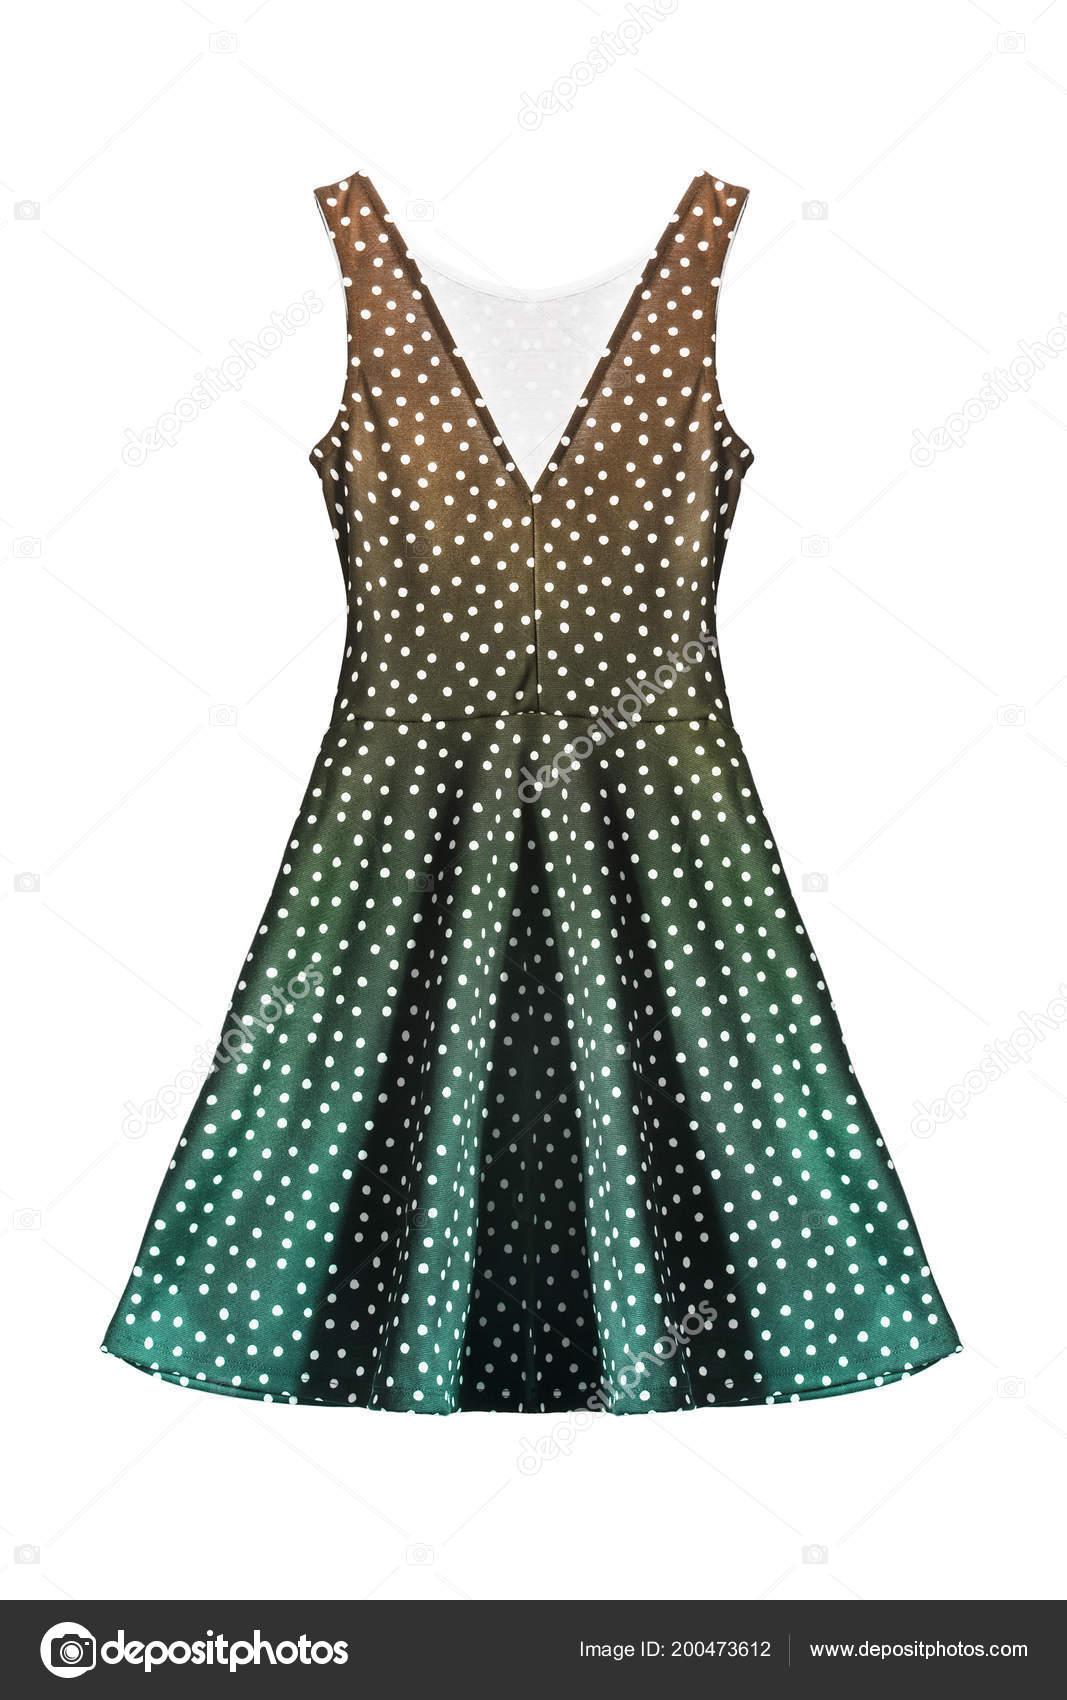 3ab13db432f Πουά Ρετρό Πολύχρωμο Αμάνικο Φόρεμα Απομονωθεί Λευκό — Φωτογραφία Αρχείου